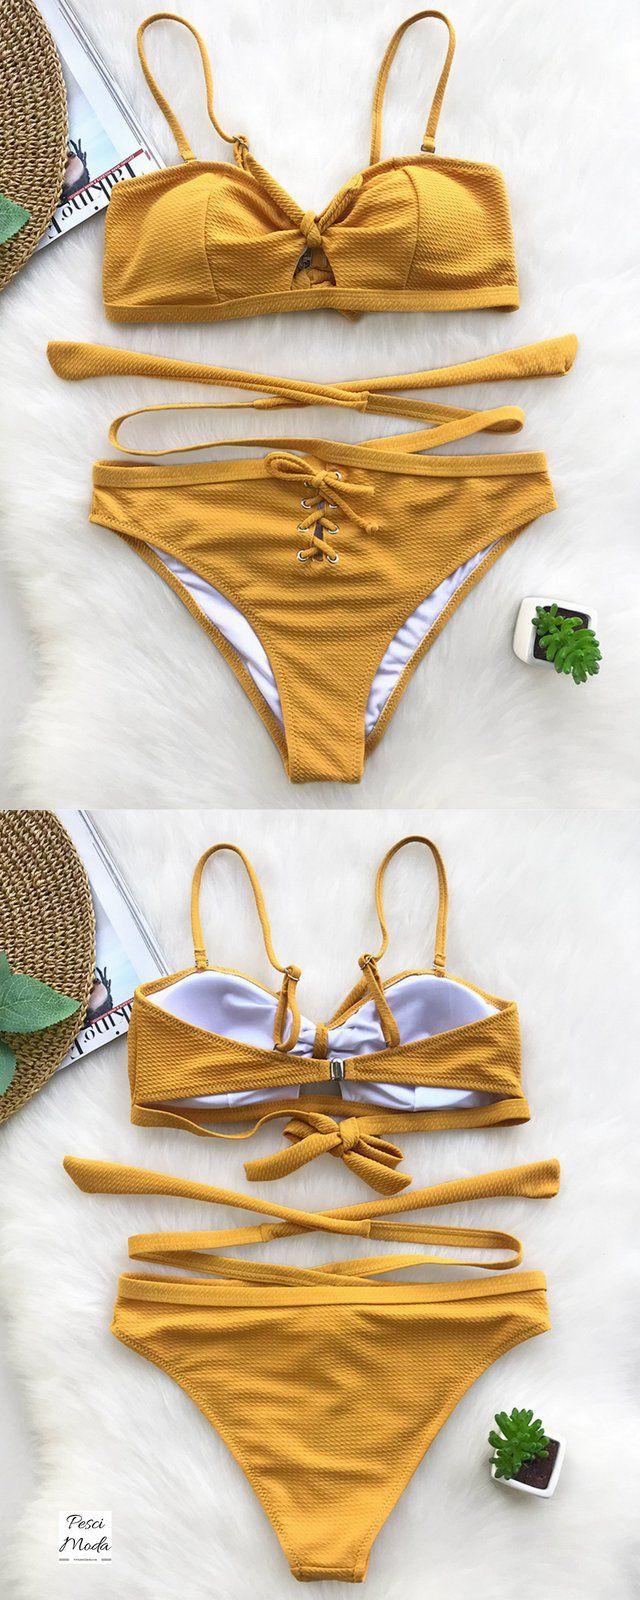 b91fbfefc0 60%Off Sale 2018 Summer Fashion Yellow Bikini Set by PesciModa. Get  Additional 10%Off your first order shop online today..!! #BikiniSets  #BikiniSetsForTeens ...